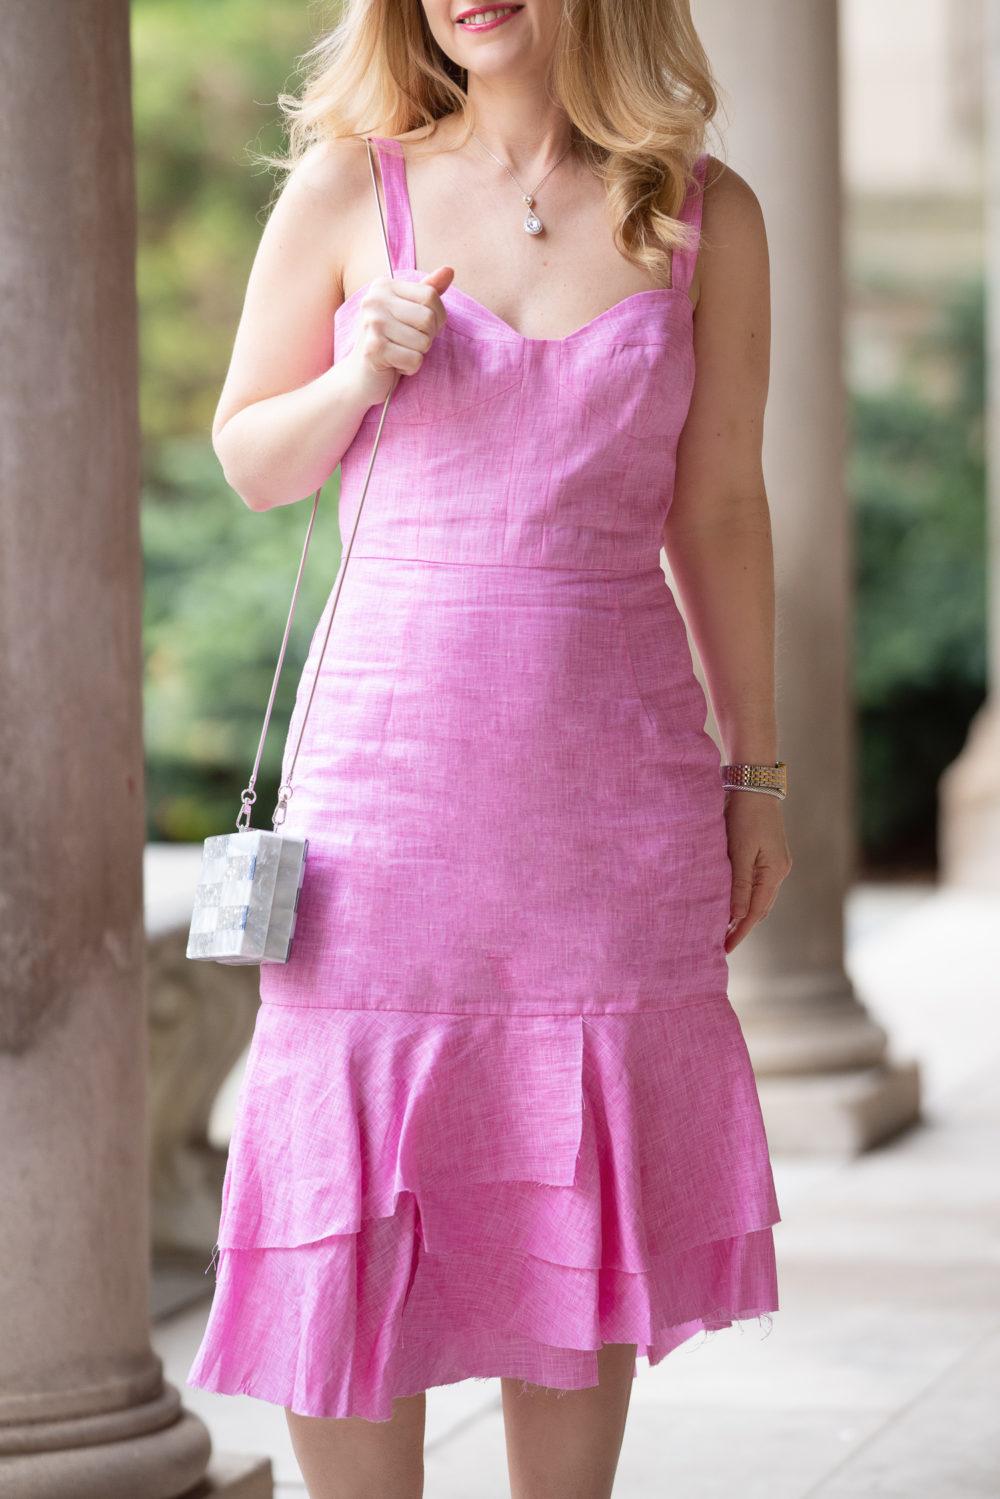 Petite Fashion Blog | Milly Kendal Dress | Milly Box Bag | Jimmy Choo Sandals | eBay Designer Jewelry